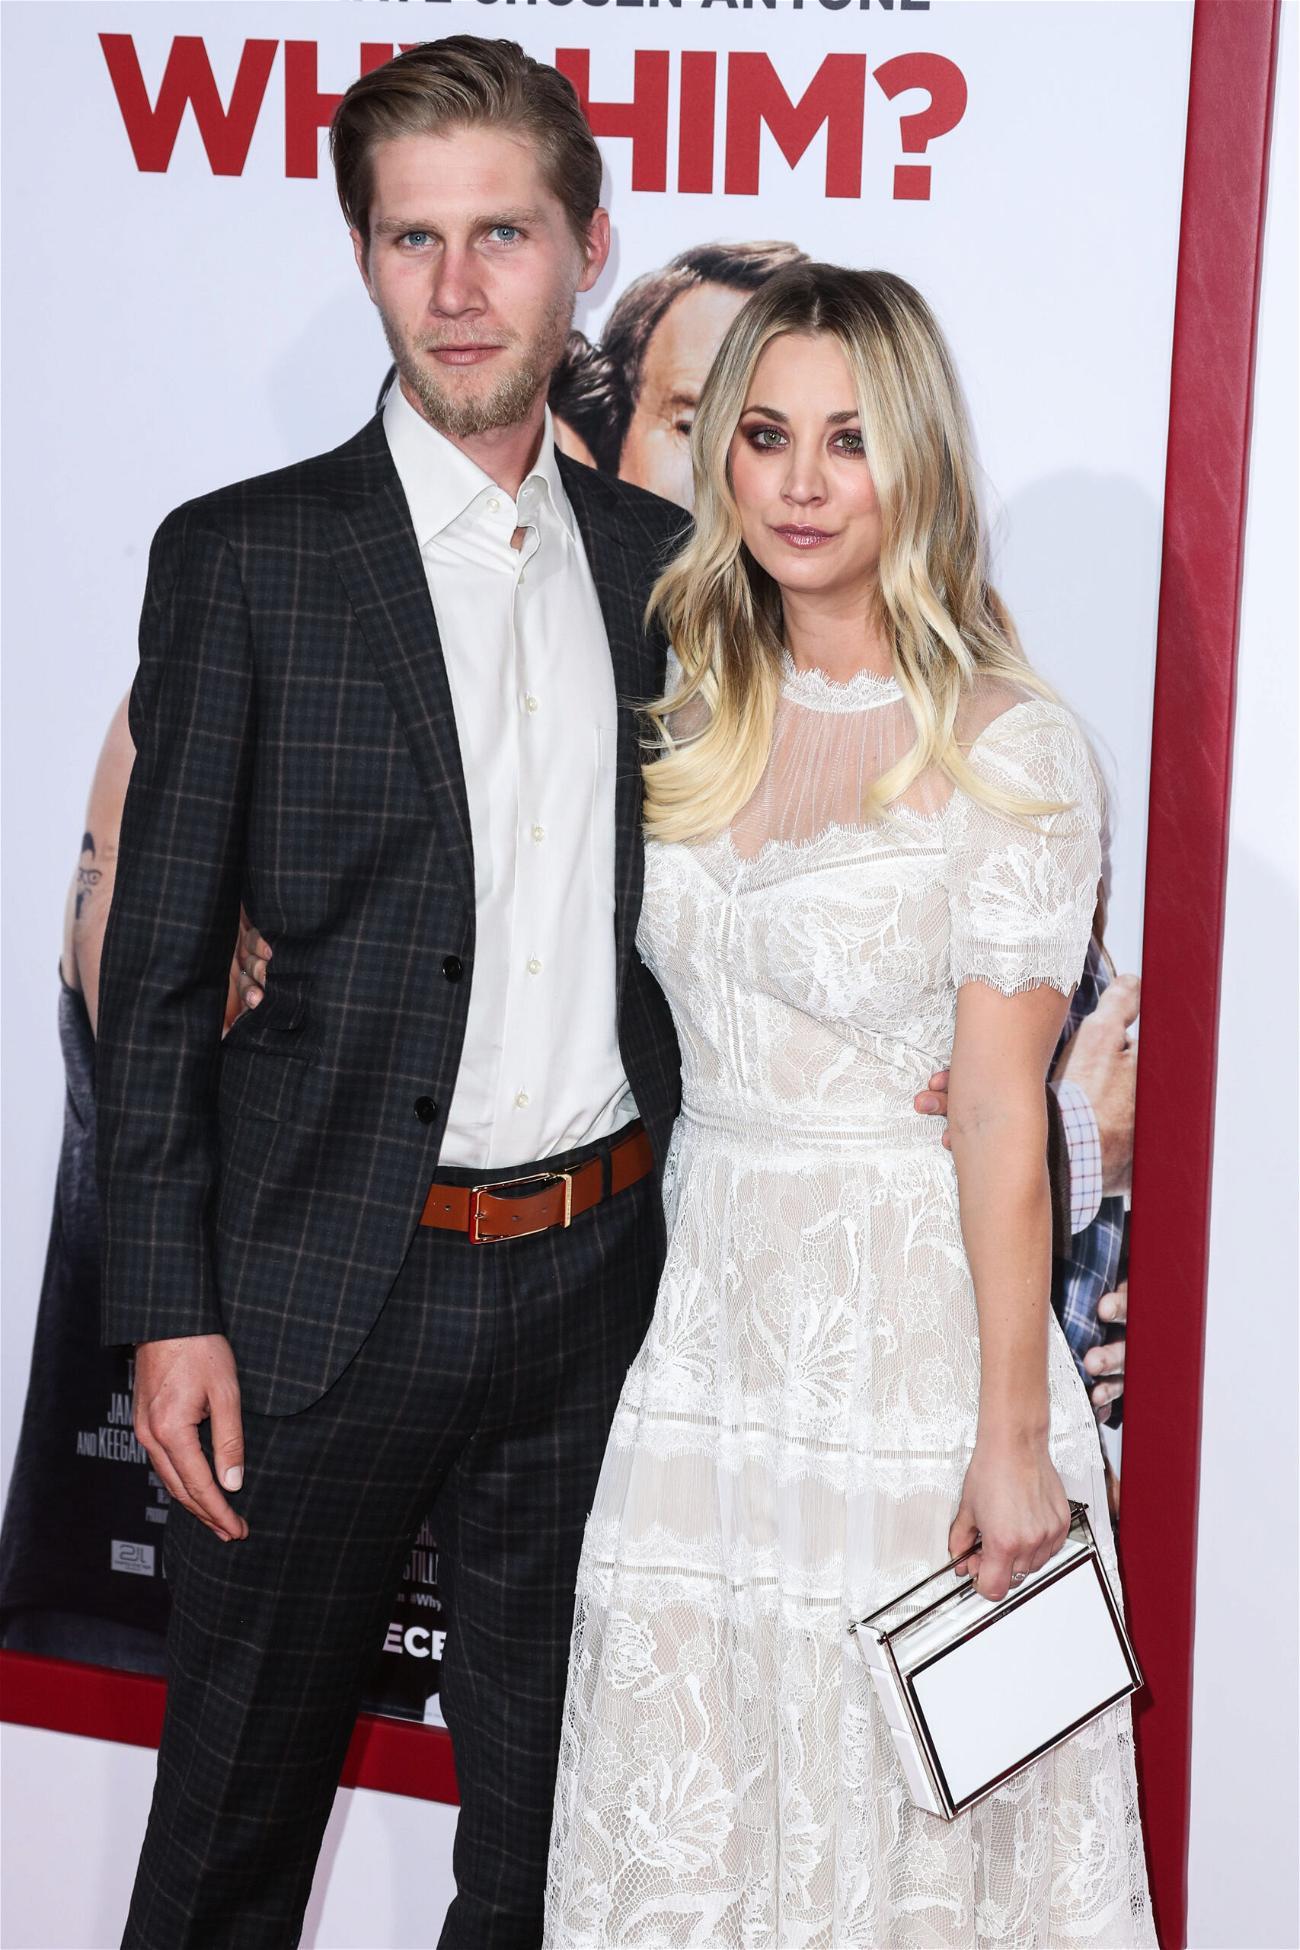 Kaley Cuoco Erases Ex-Husband From Social Media Account